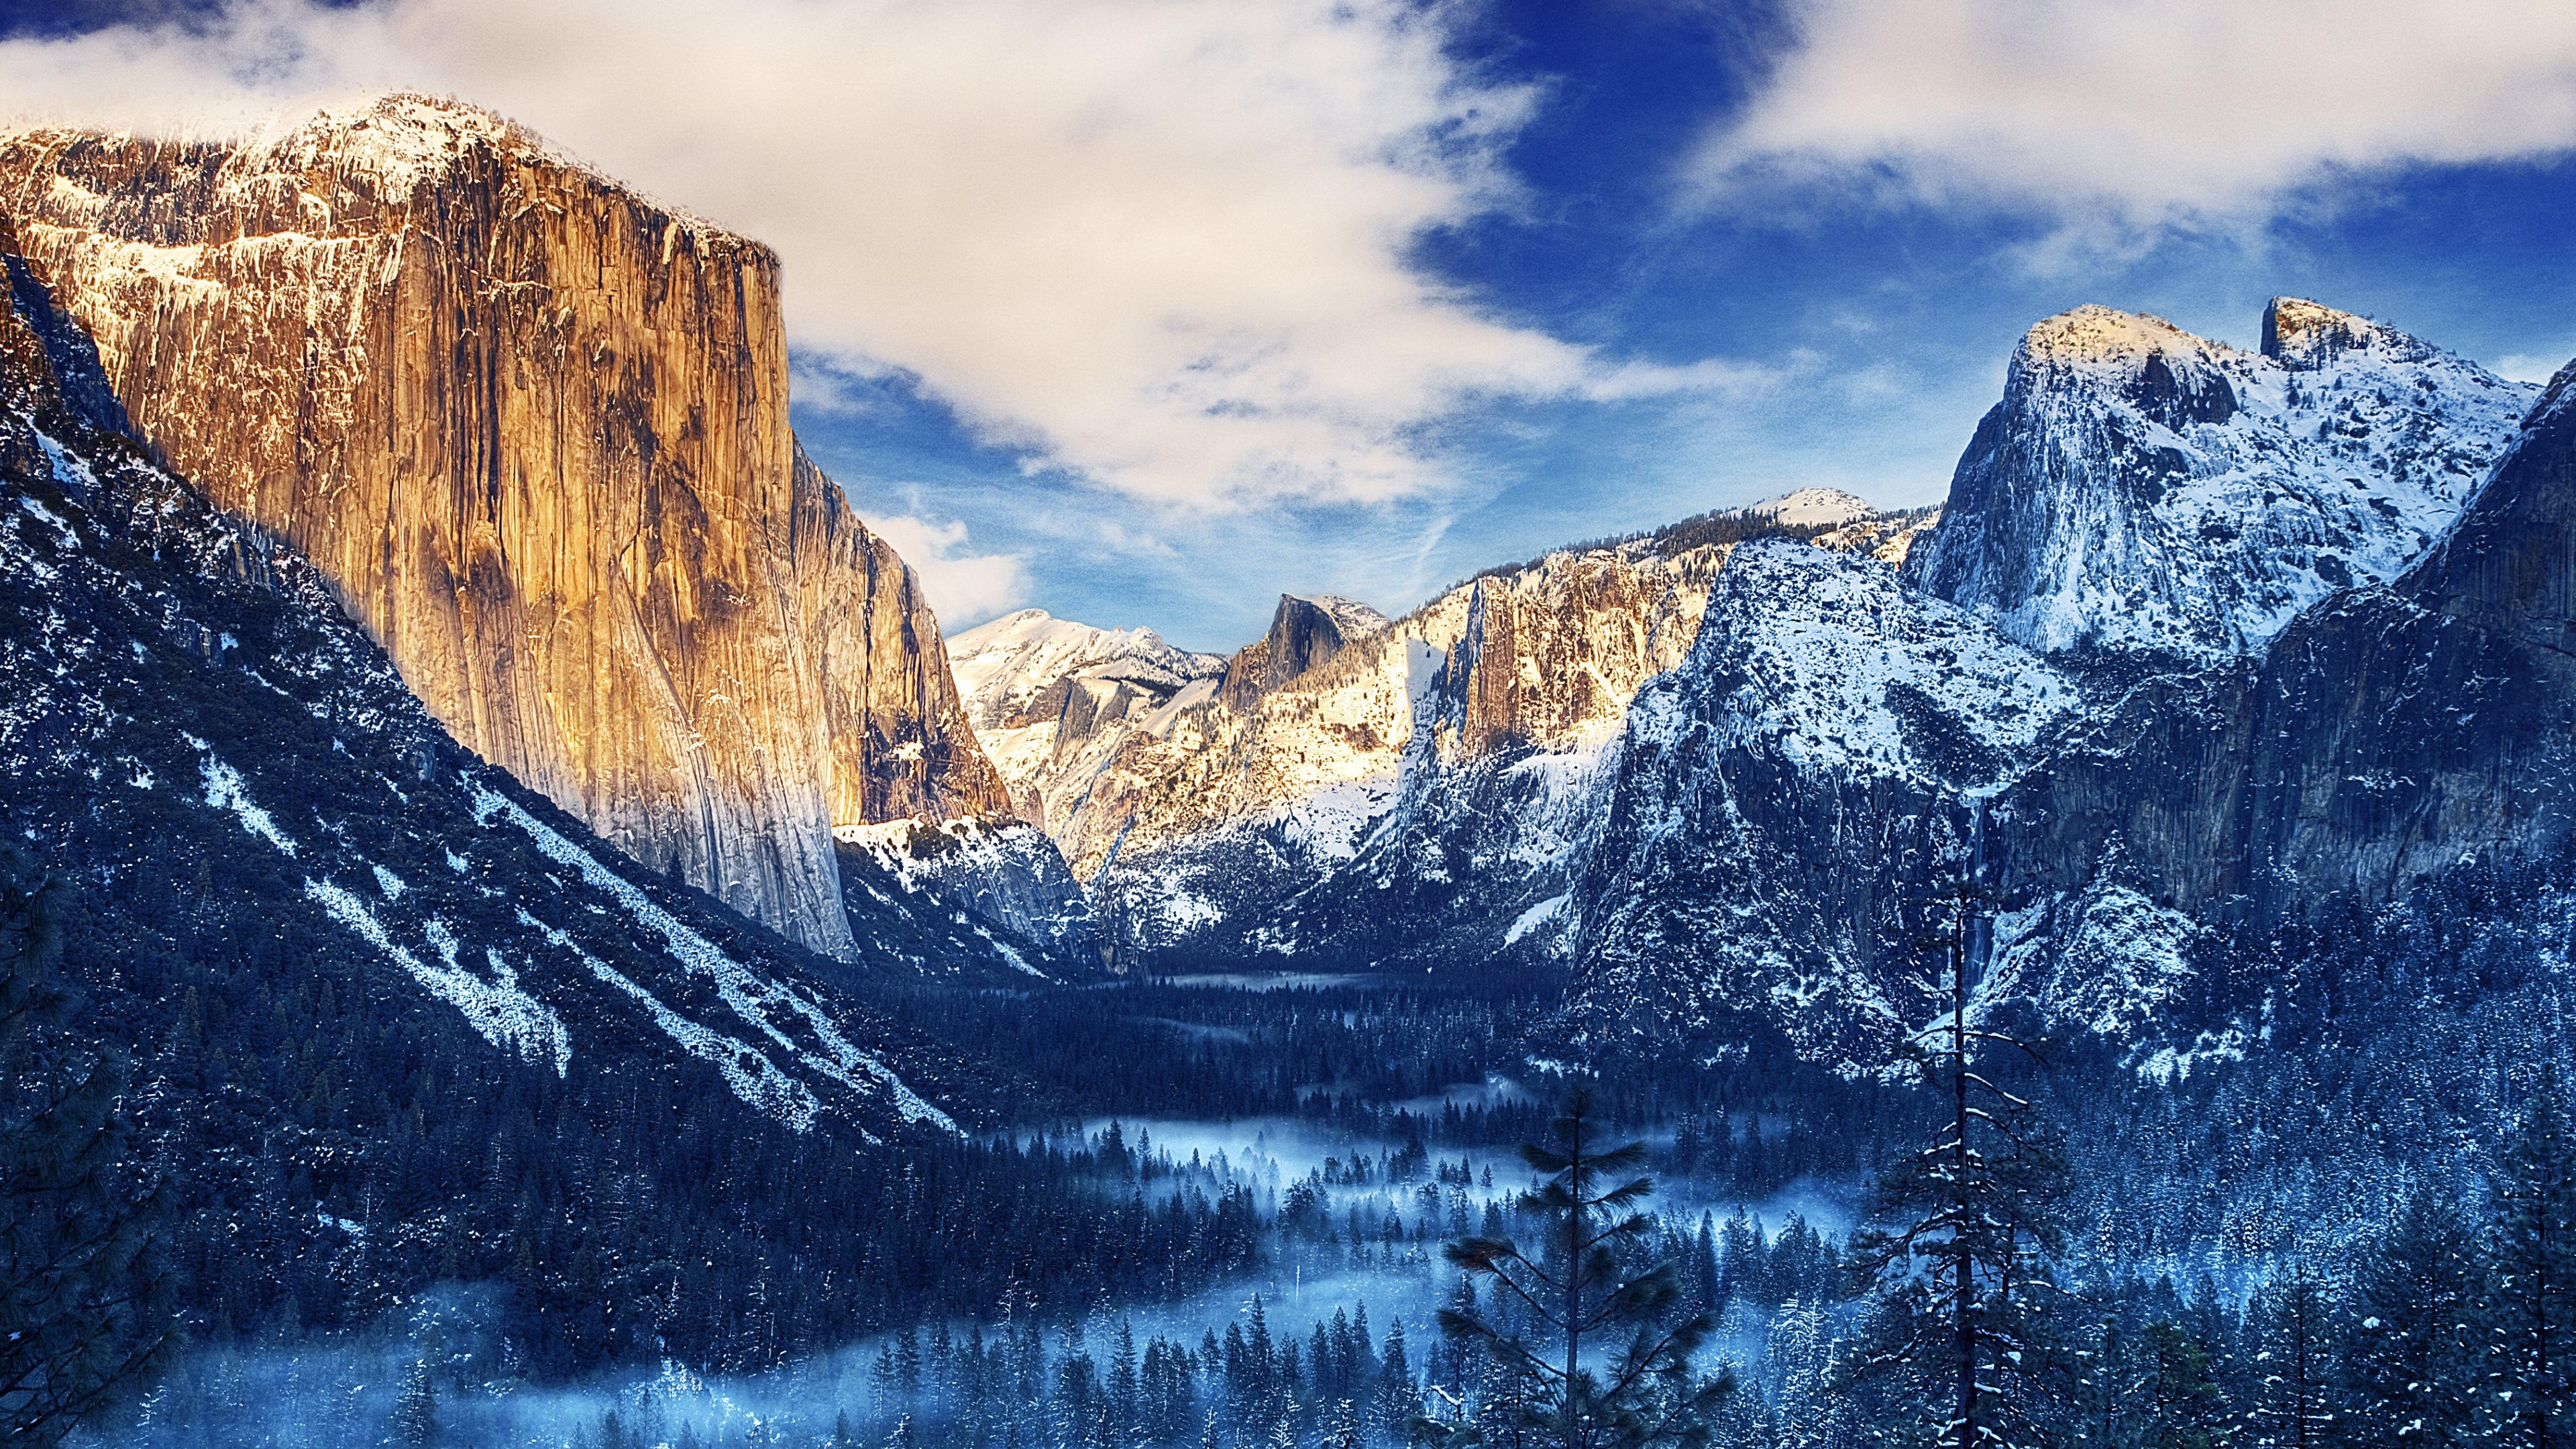 Sunrise   Tunnel View in Yosemite Valley Yosemite National Park 3840x2160